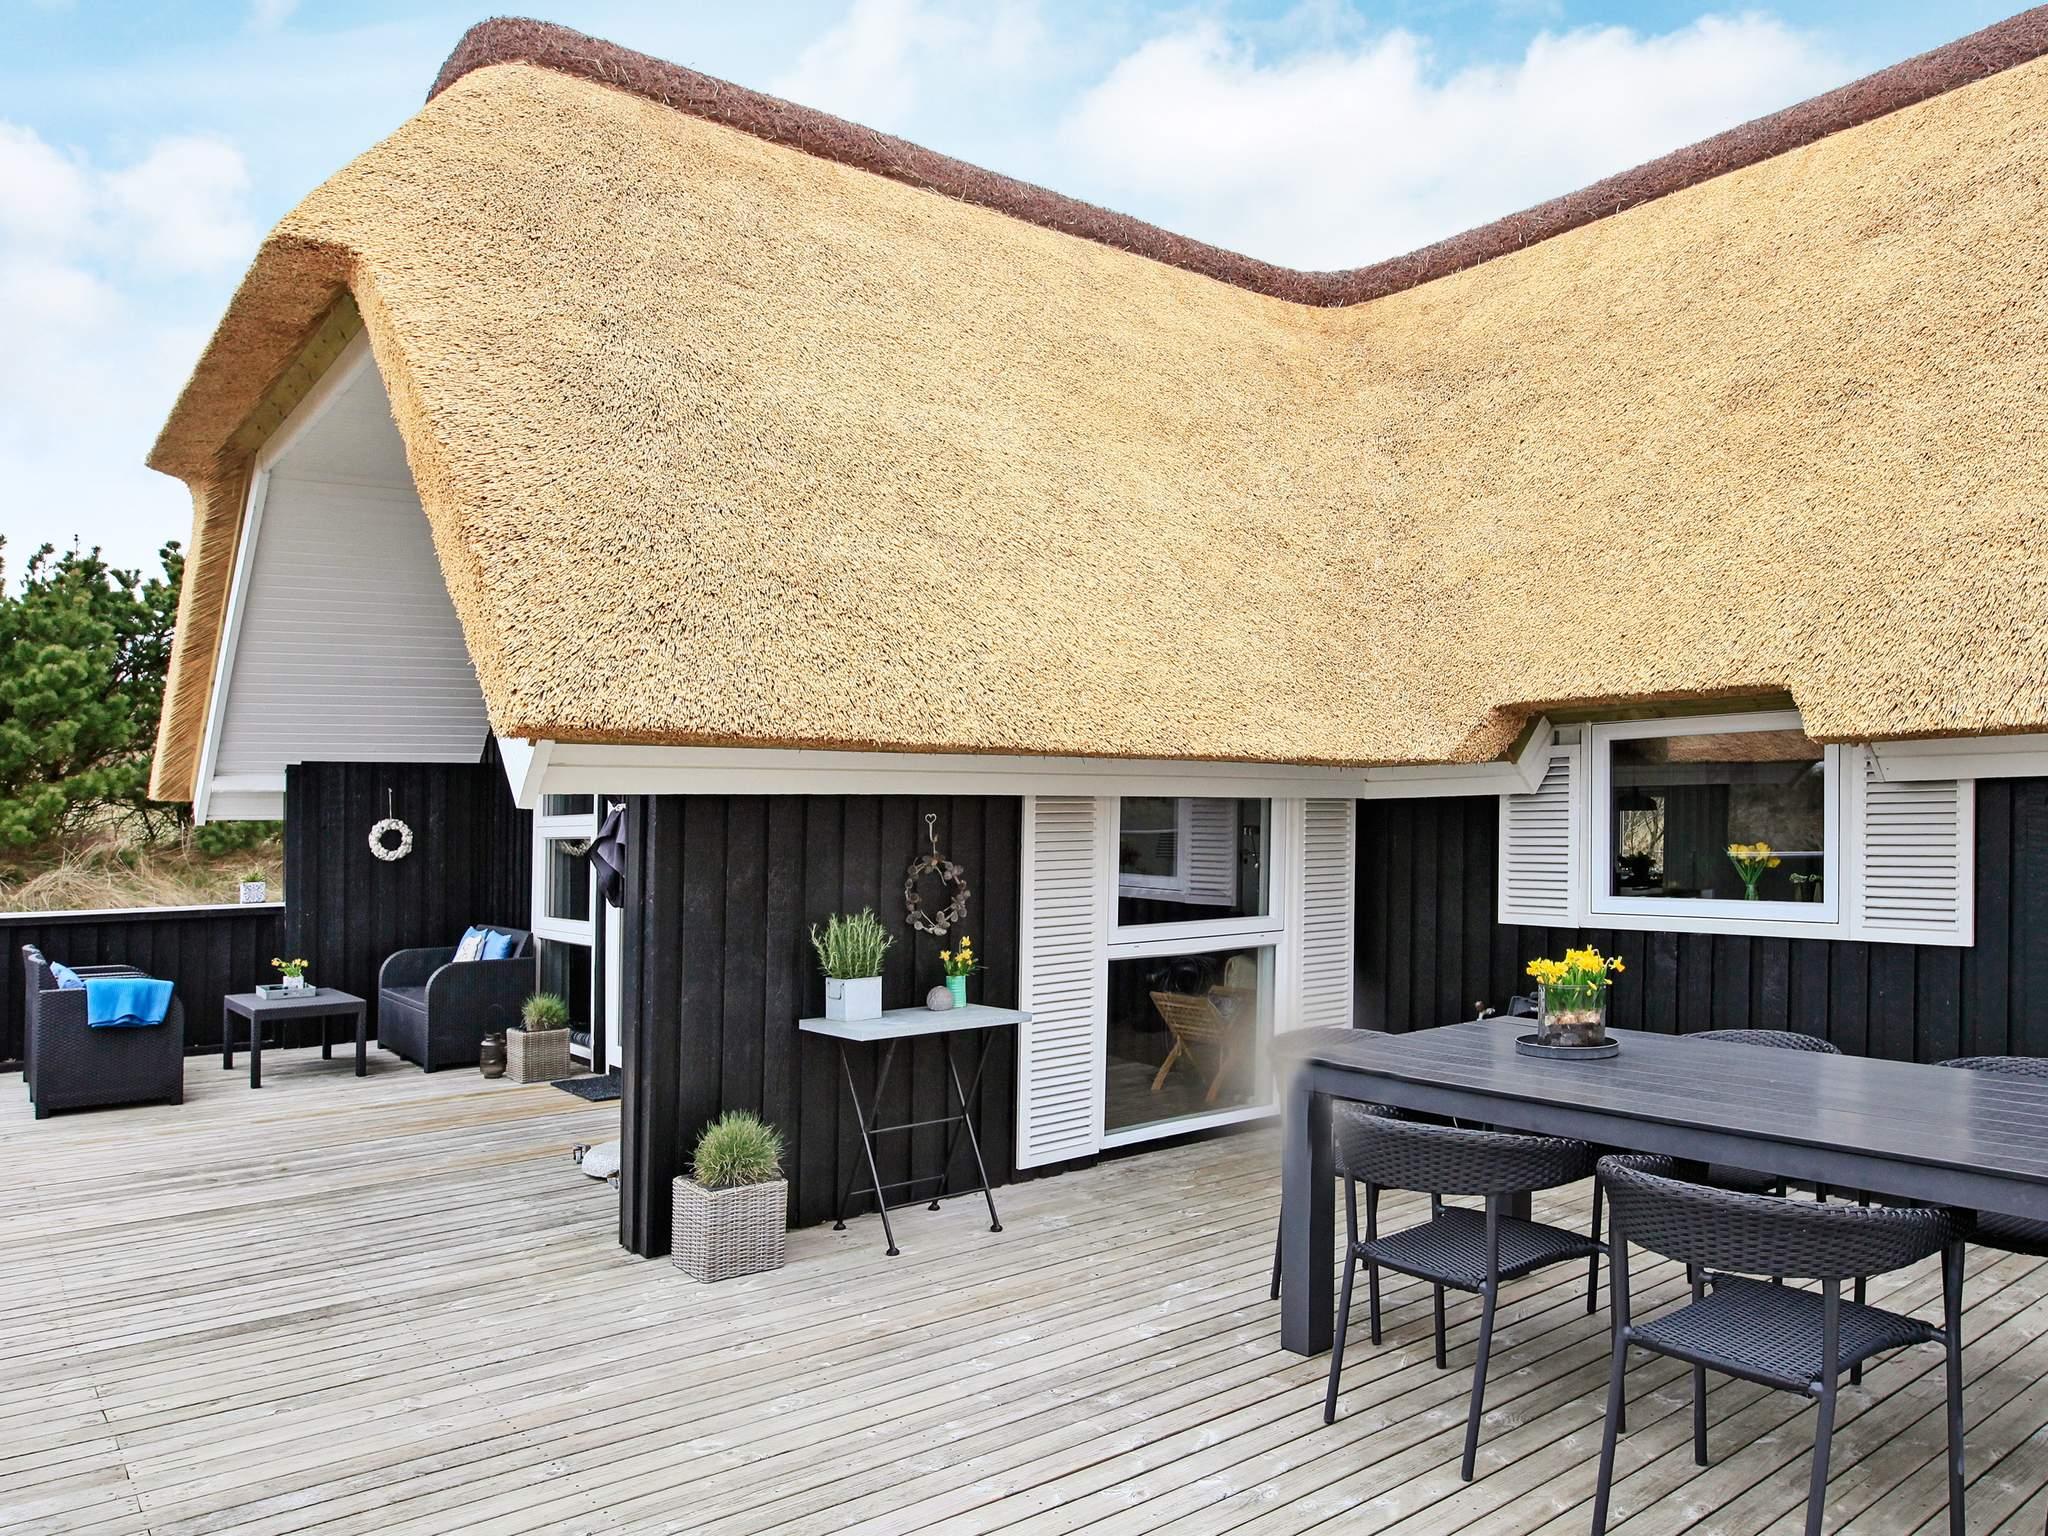 Ferienhaus Blåvand (84512), Blåvand, , Westjütland, Dänemark, Bild 23